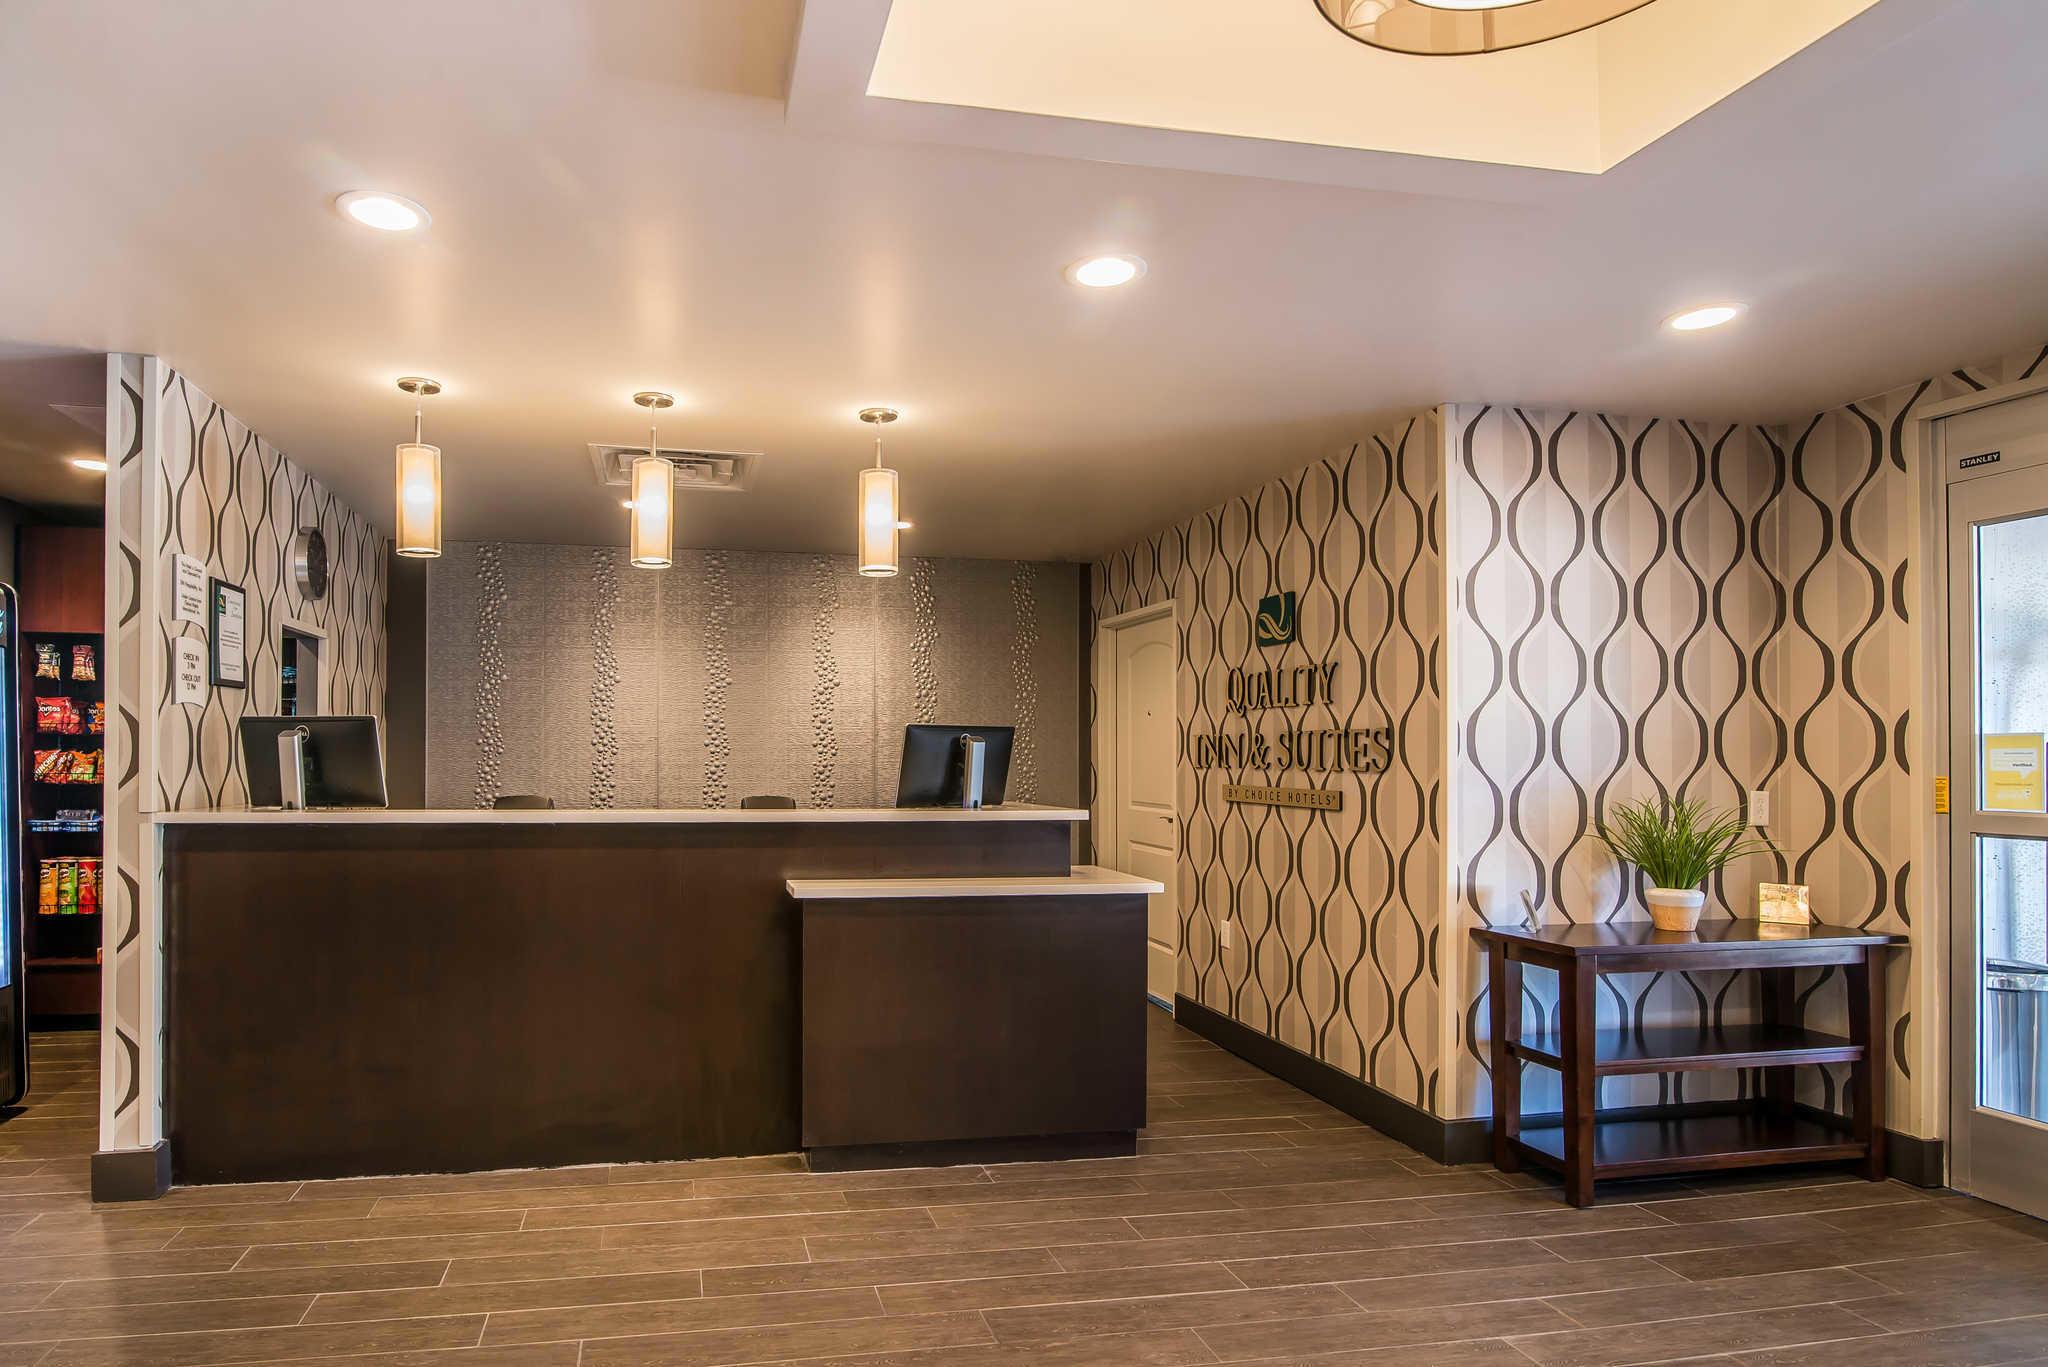 Quality Inn & Suites - Ruidoso Hwy 70 image 4